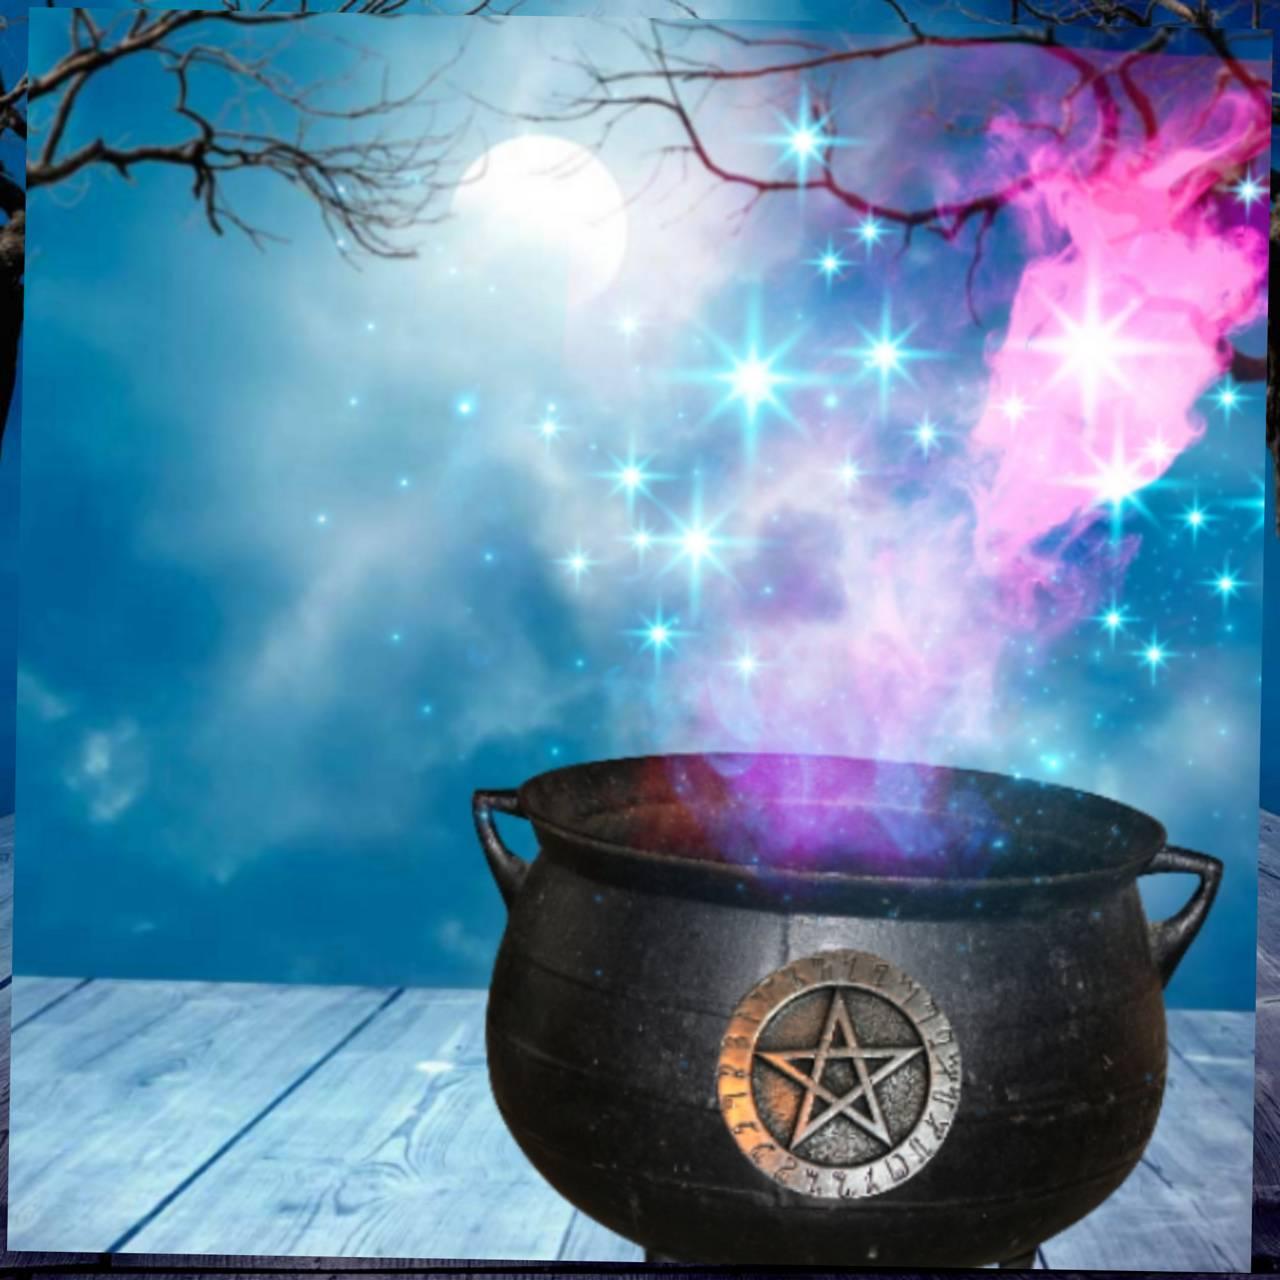 Cauldron of Magick